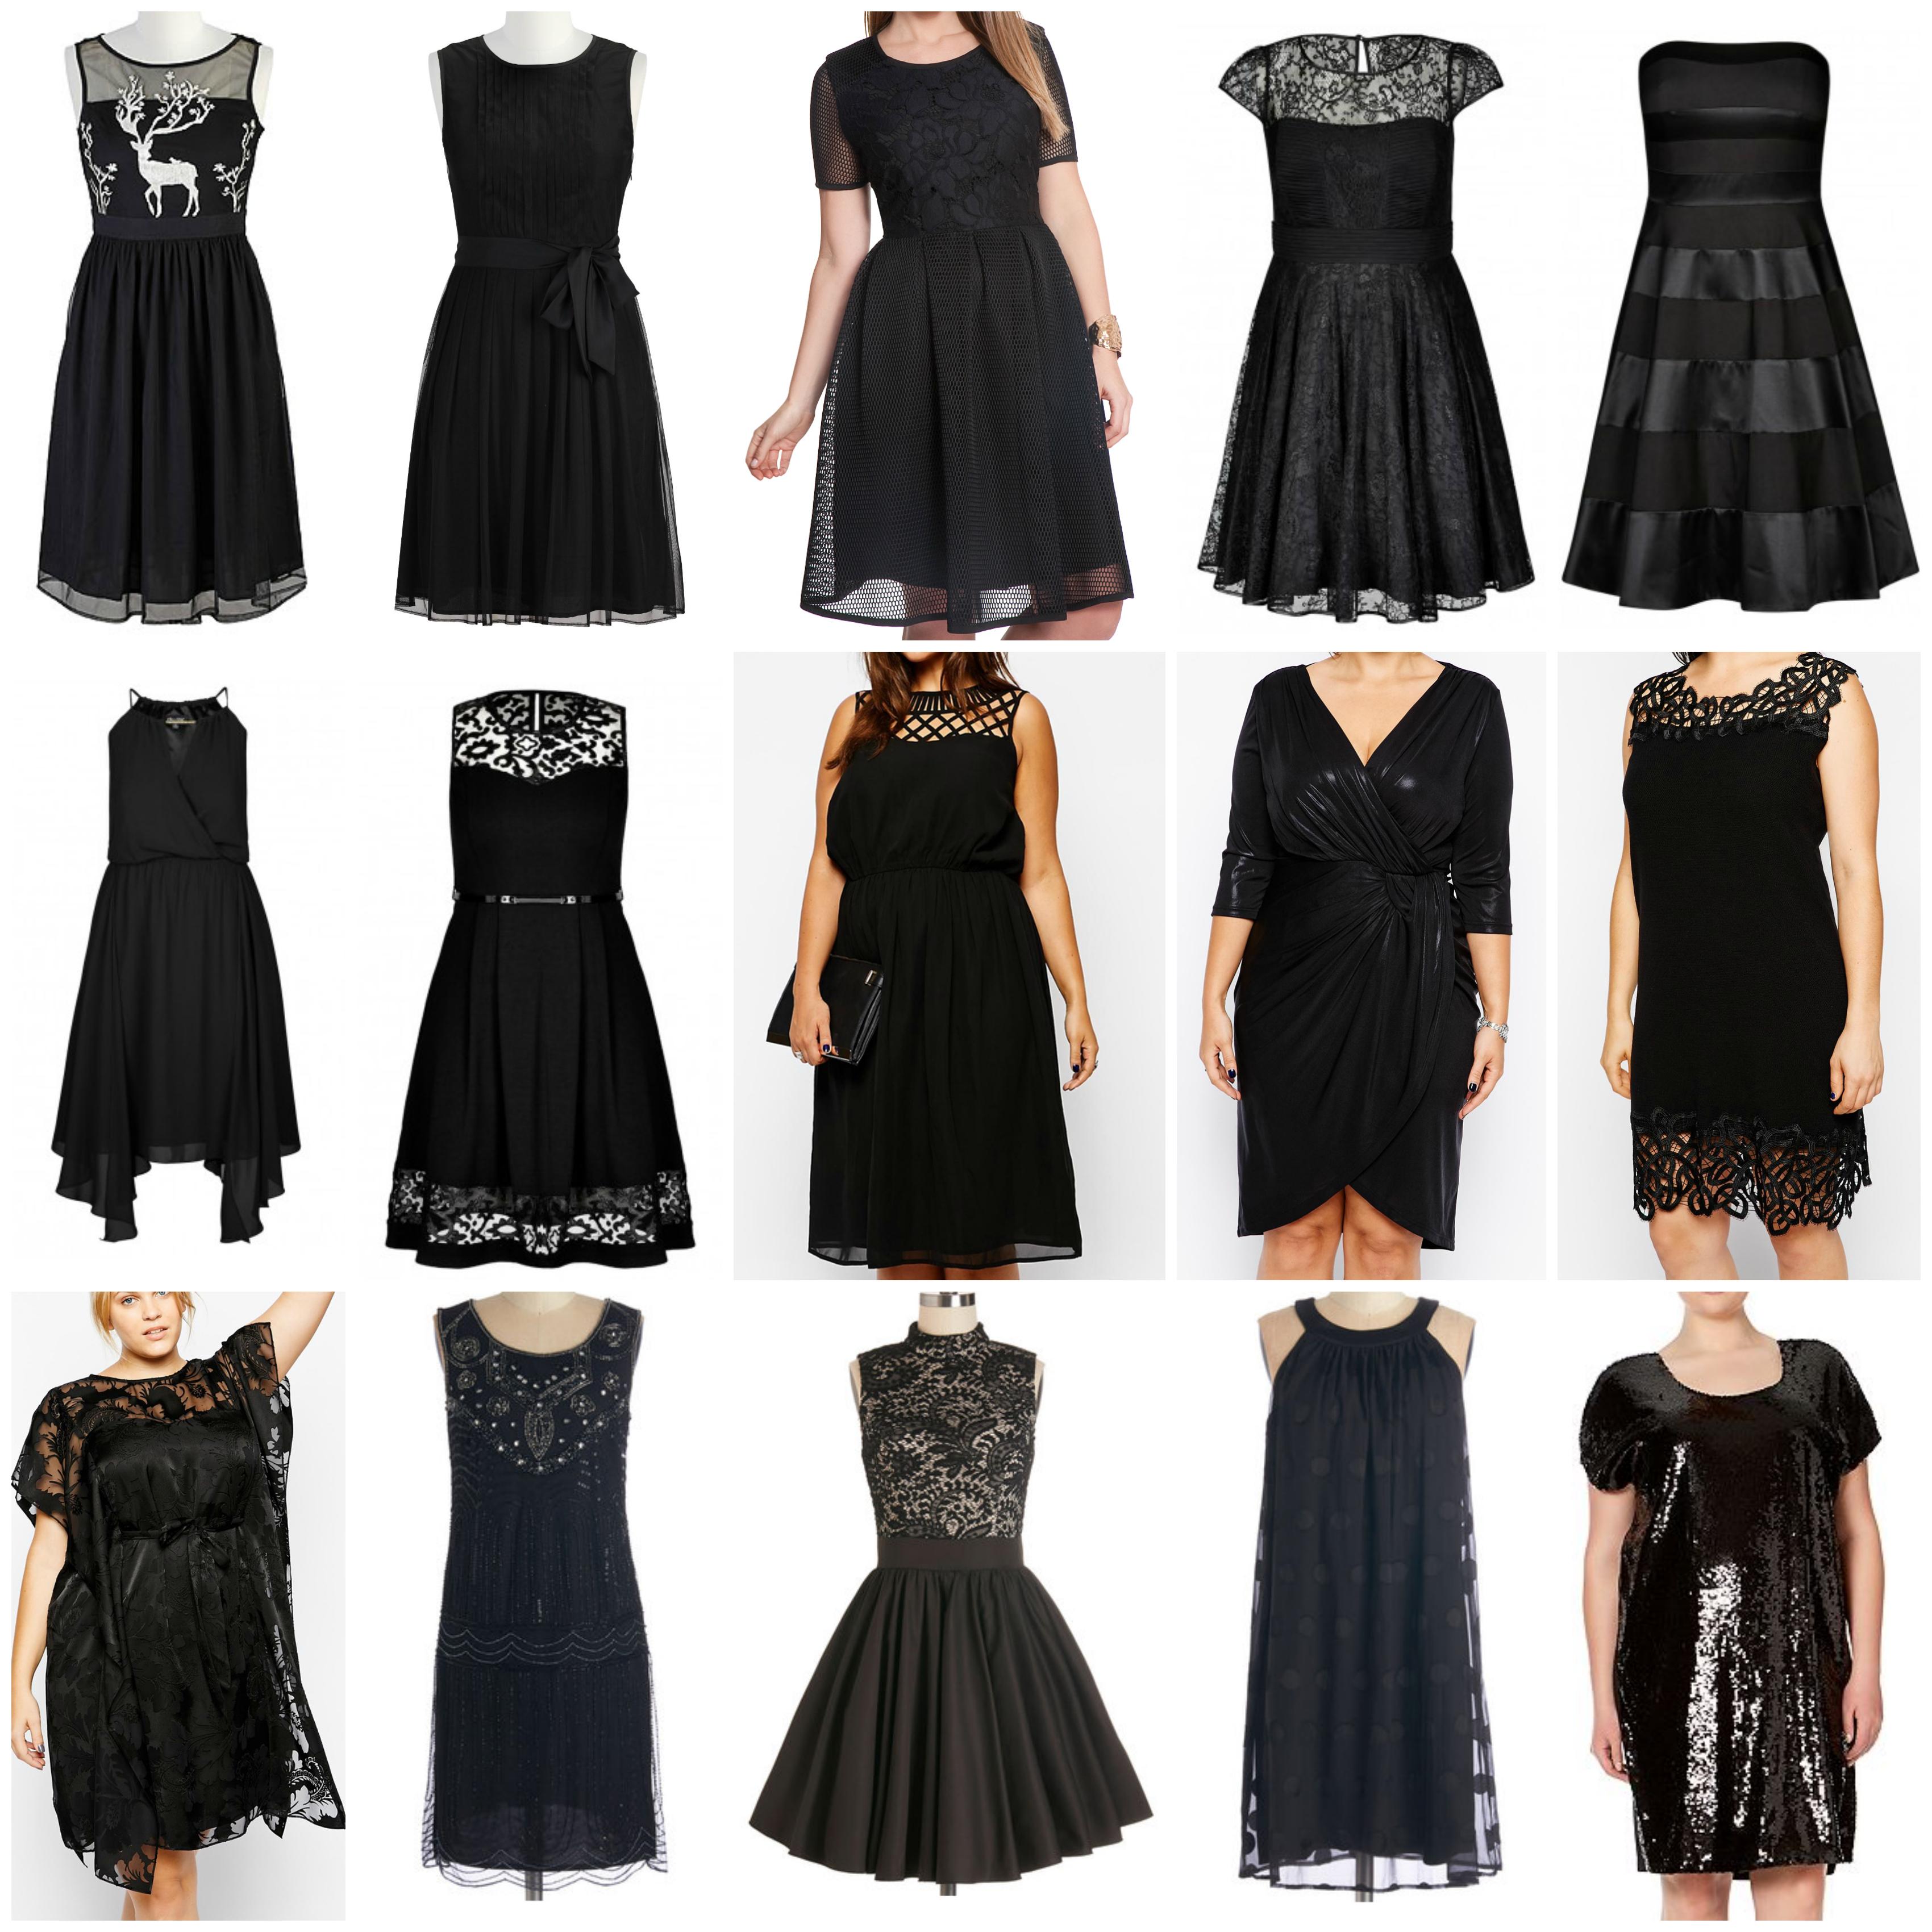 little black dresses in plus sizes // margotmeanie.com